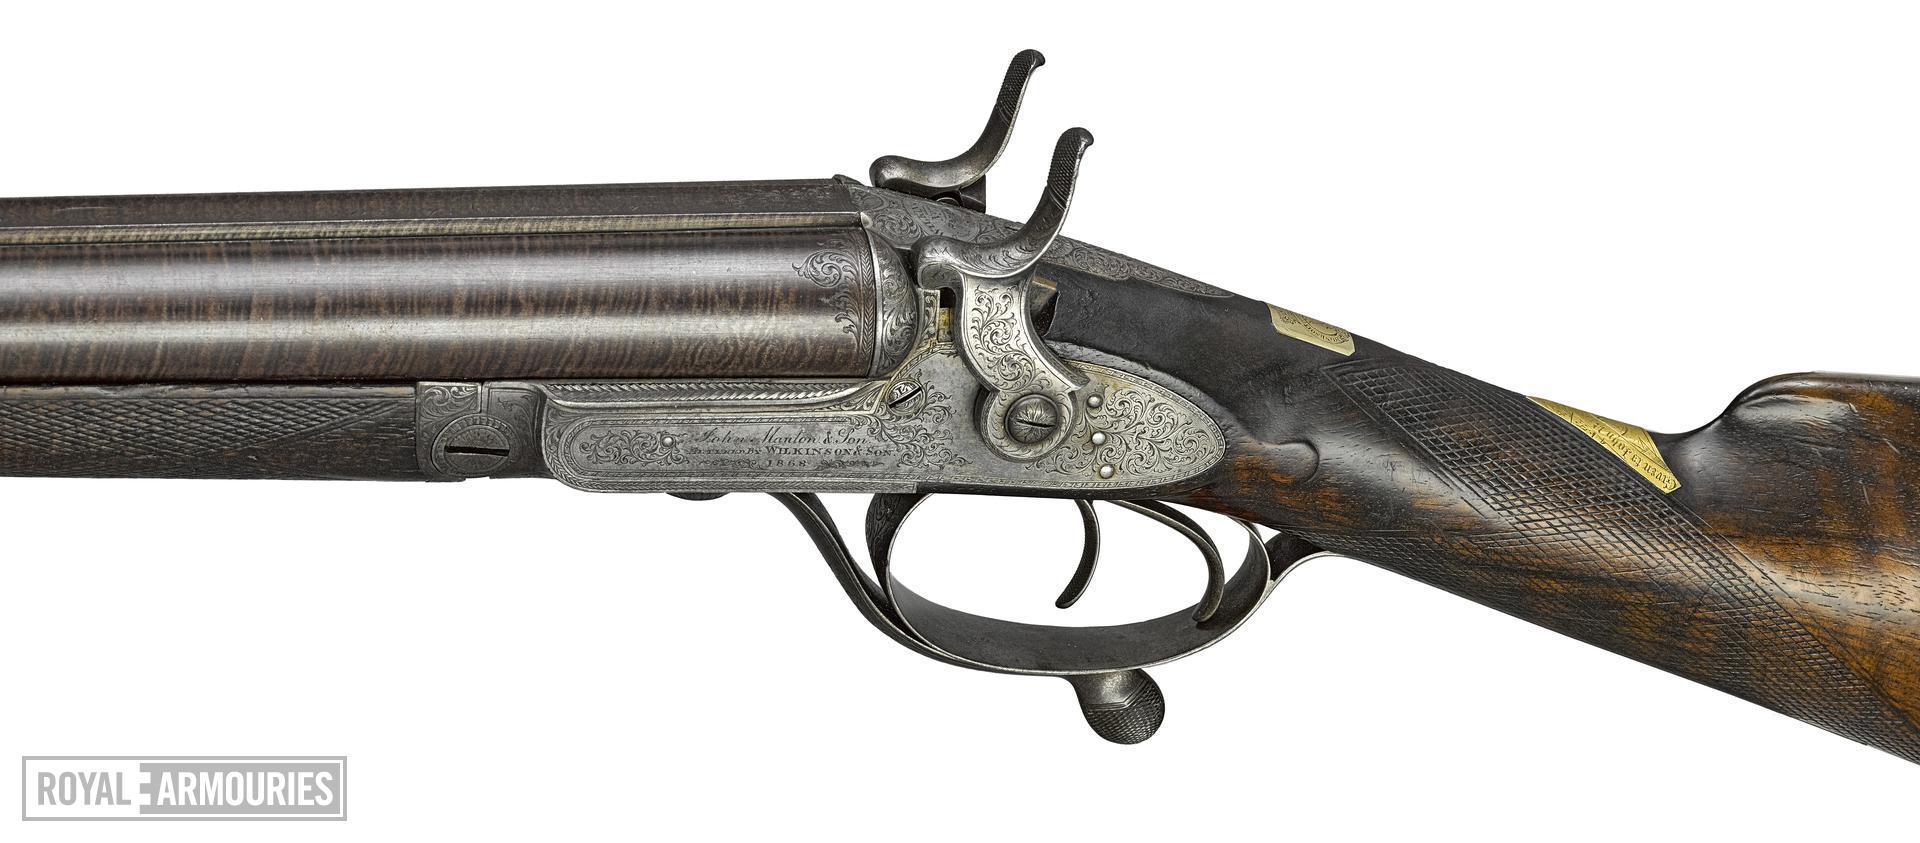 Centrefire breech-loading double-barrelled hammer shotgun